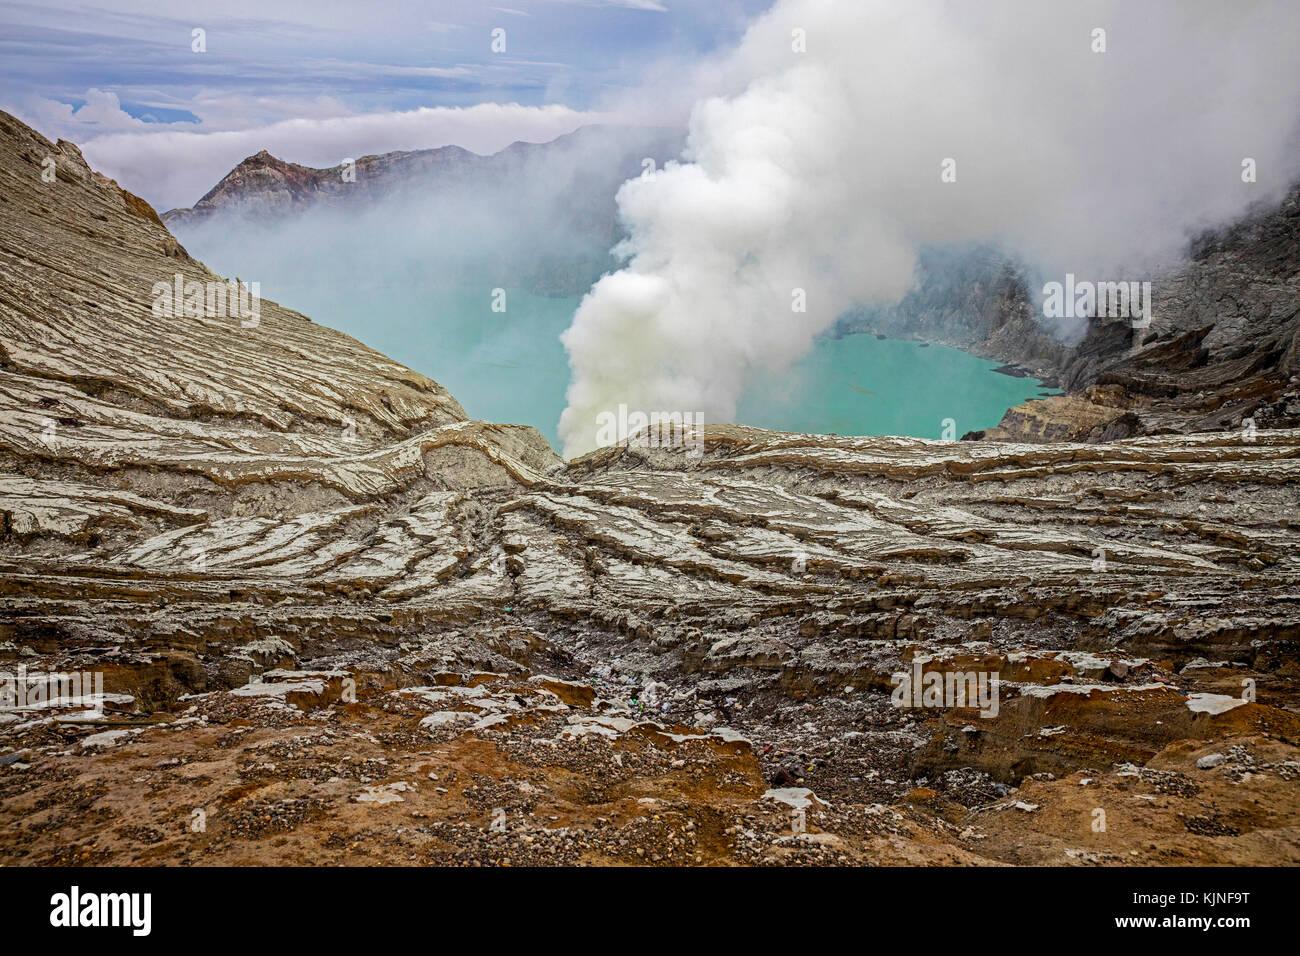 Sulfuric lake of Kawah Ijen Mountain's cauldron in the Banyuwangi Regency of East Java, Indonesia - Stock Image